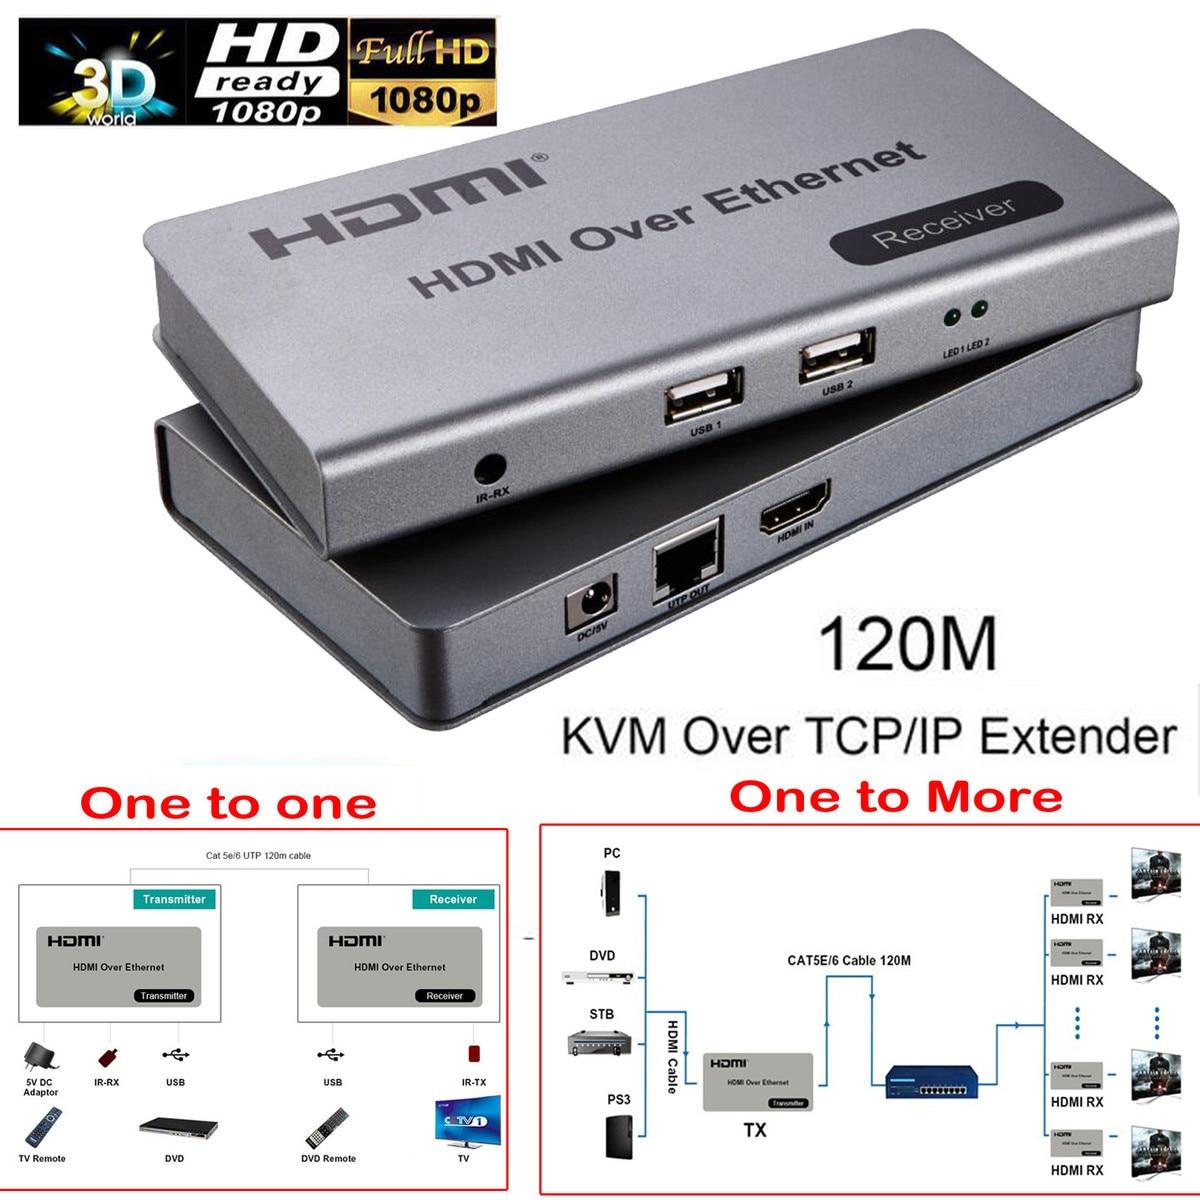 HDMI TCP/IP 120 meters Full HD 1080P Mouse KeyBoard USB KVM Extender Via cat5e/6 Ethernet RJ45 Cable HDCP + IR Remote Extender